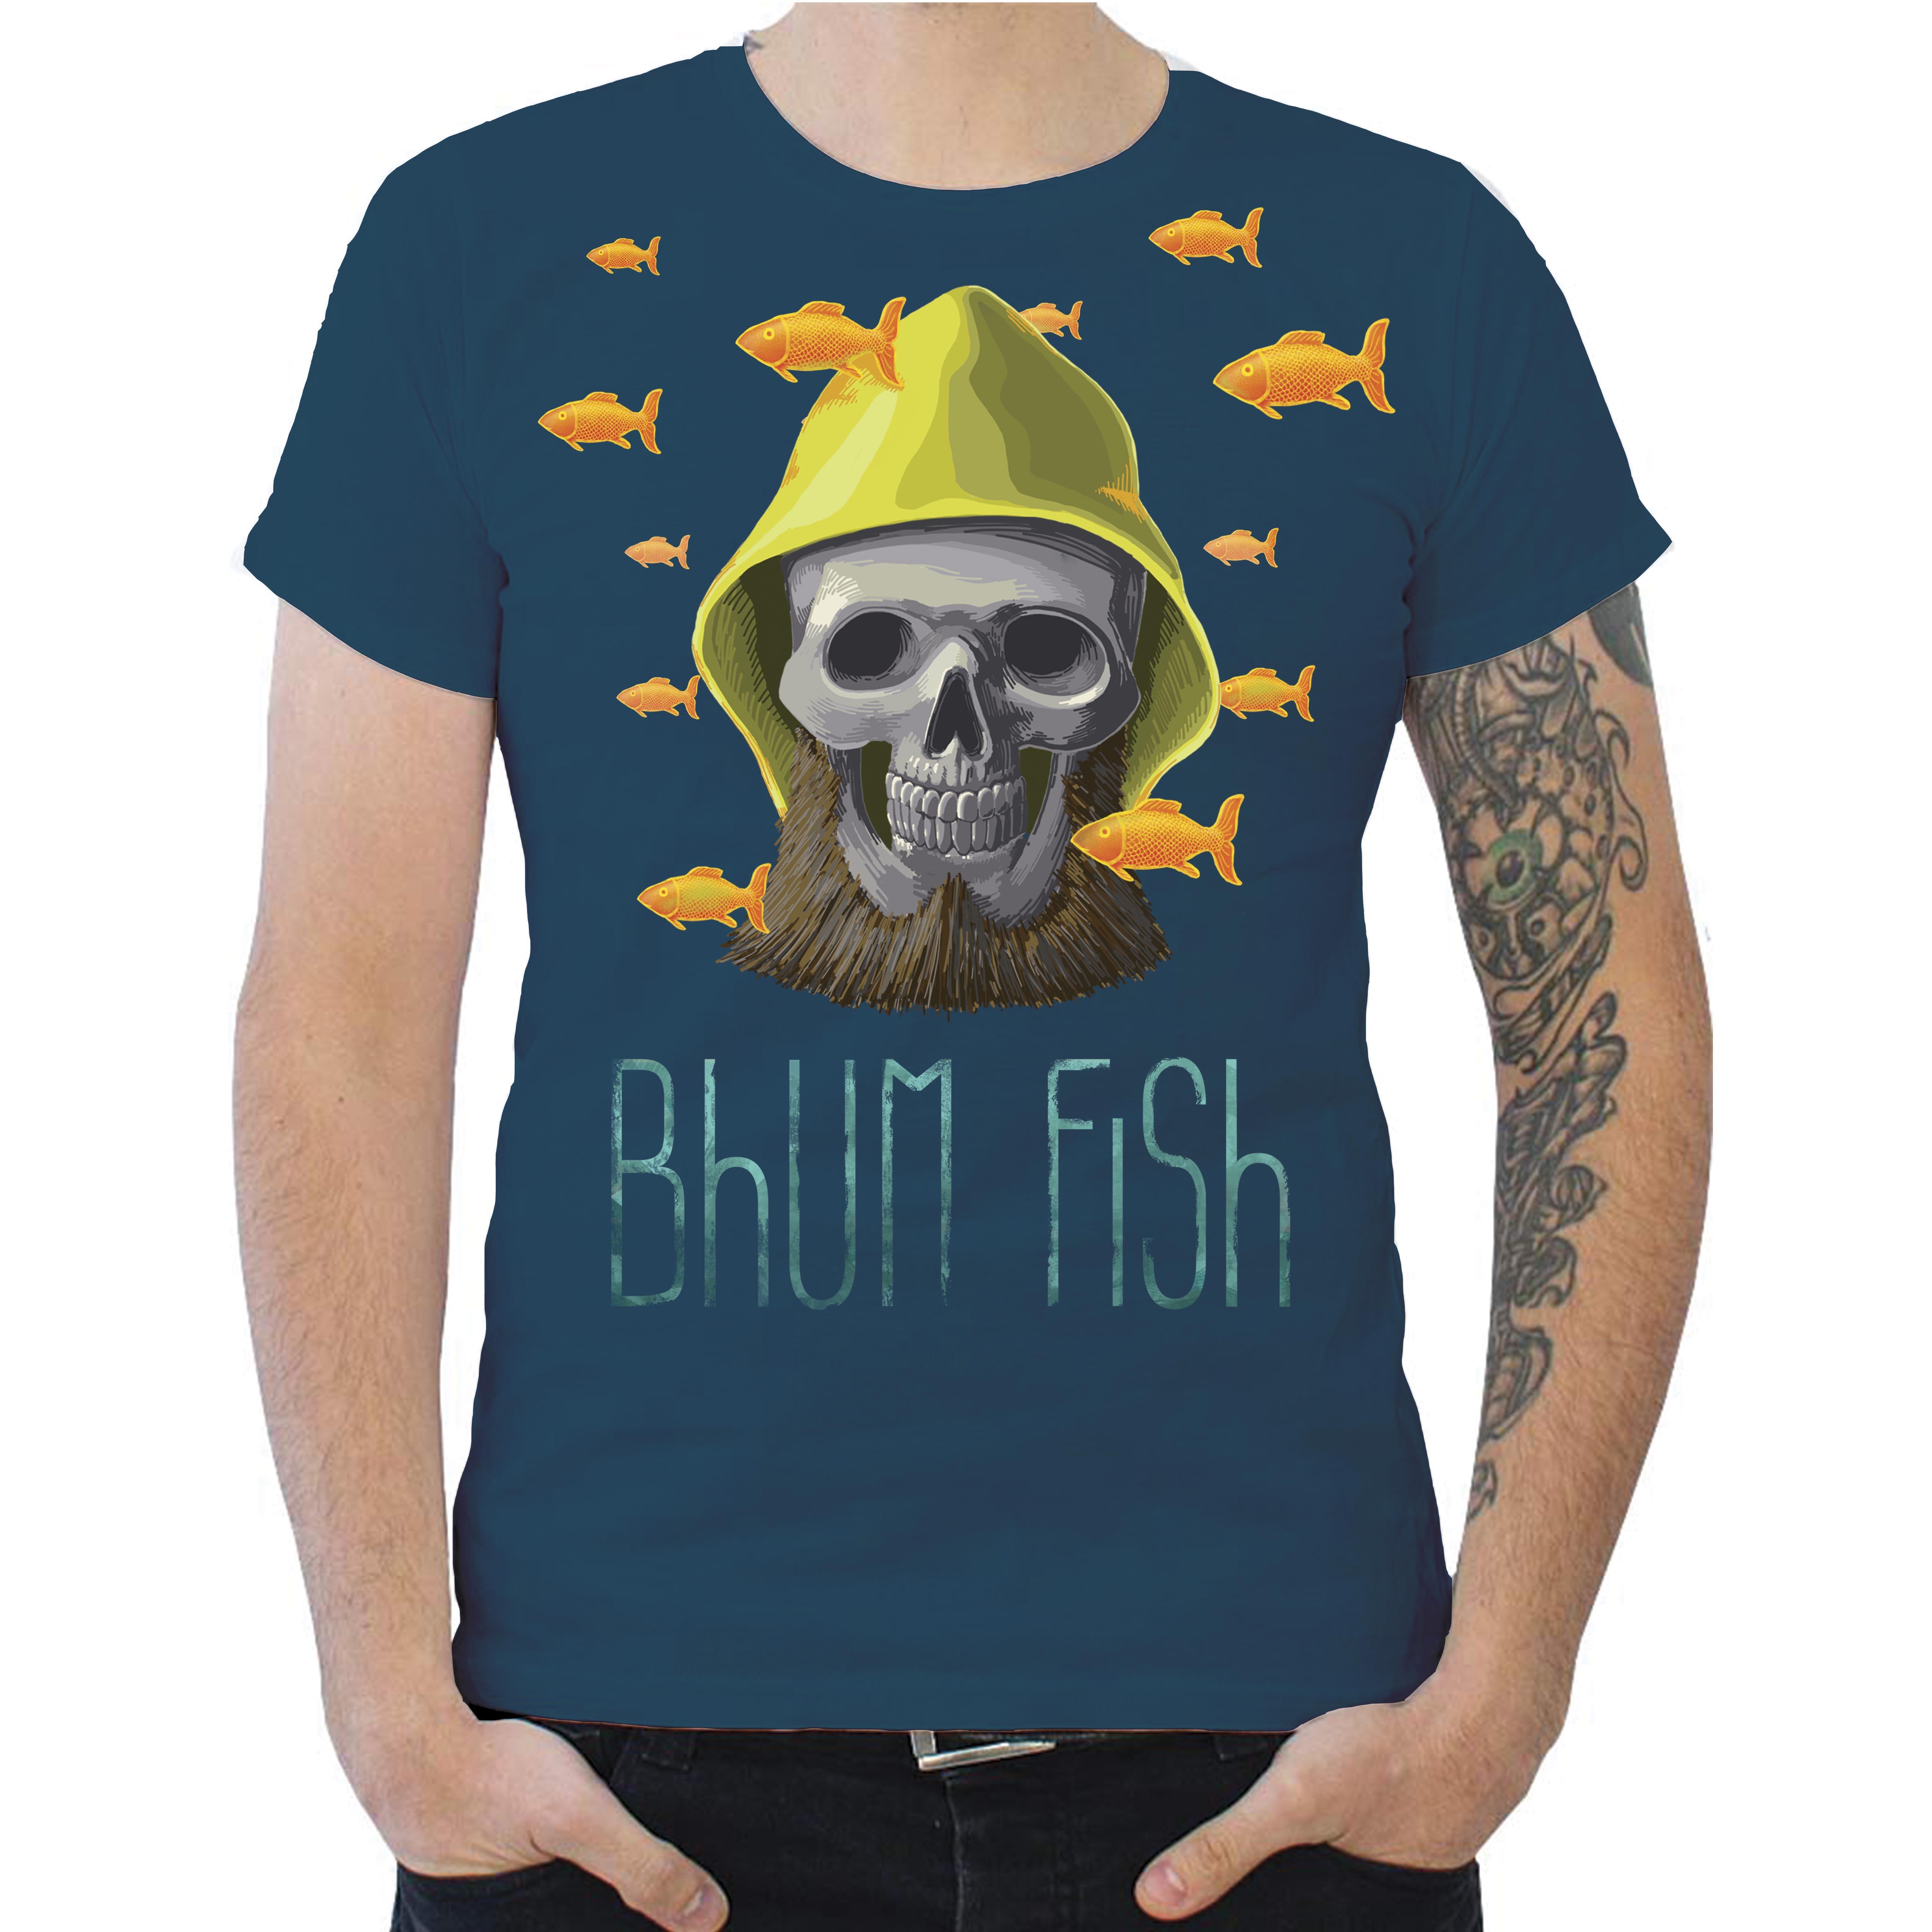 Arven's truks Bhumfish